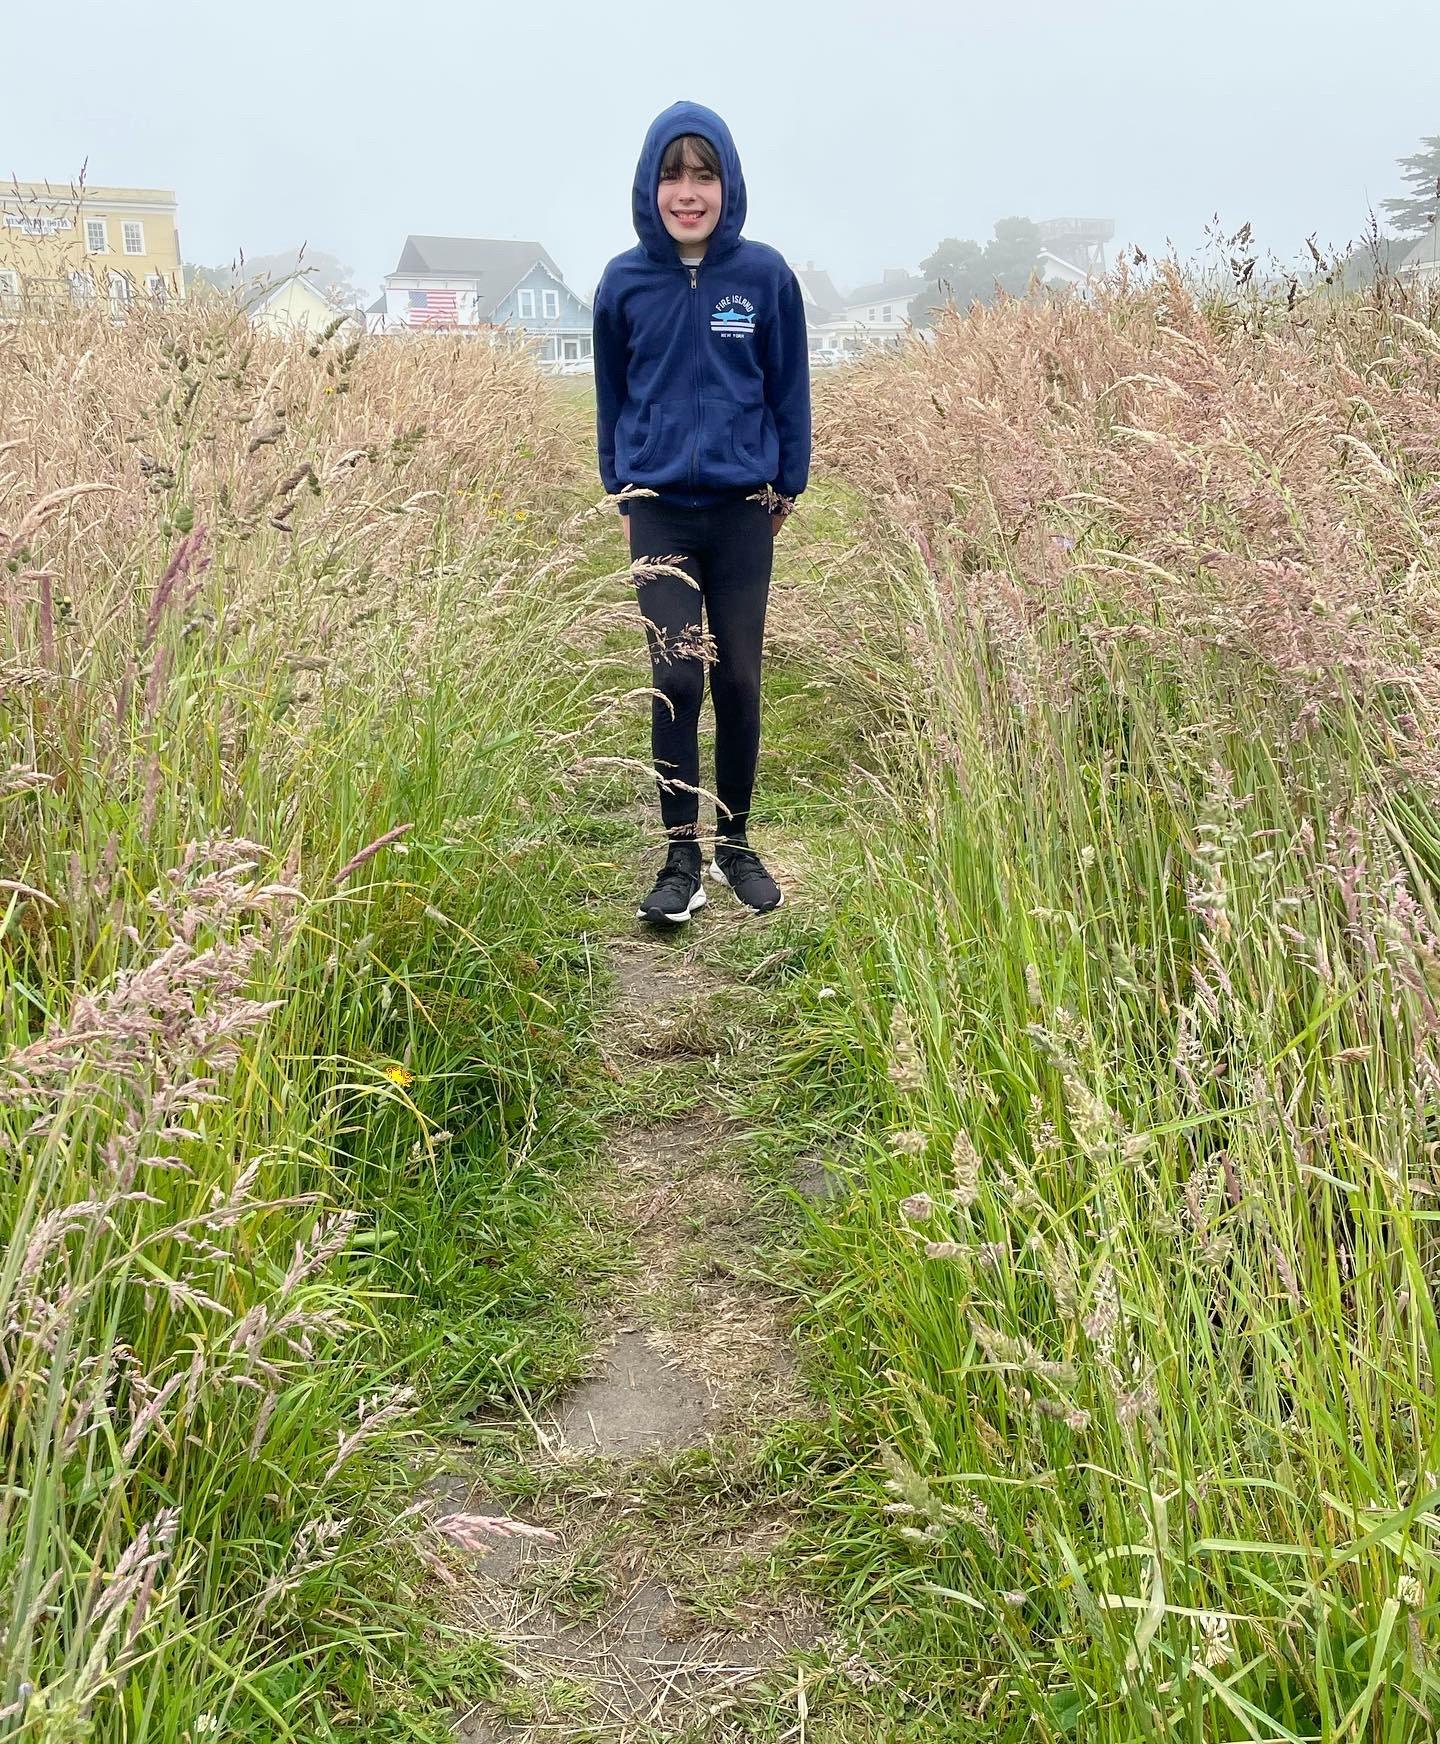 Mendocino kids hike